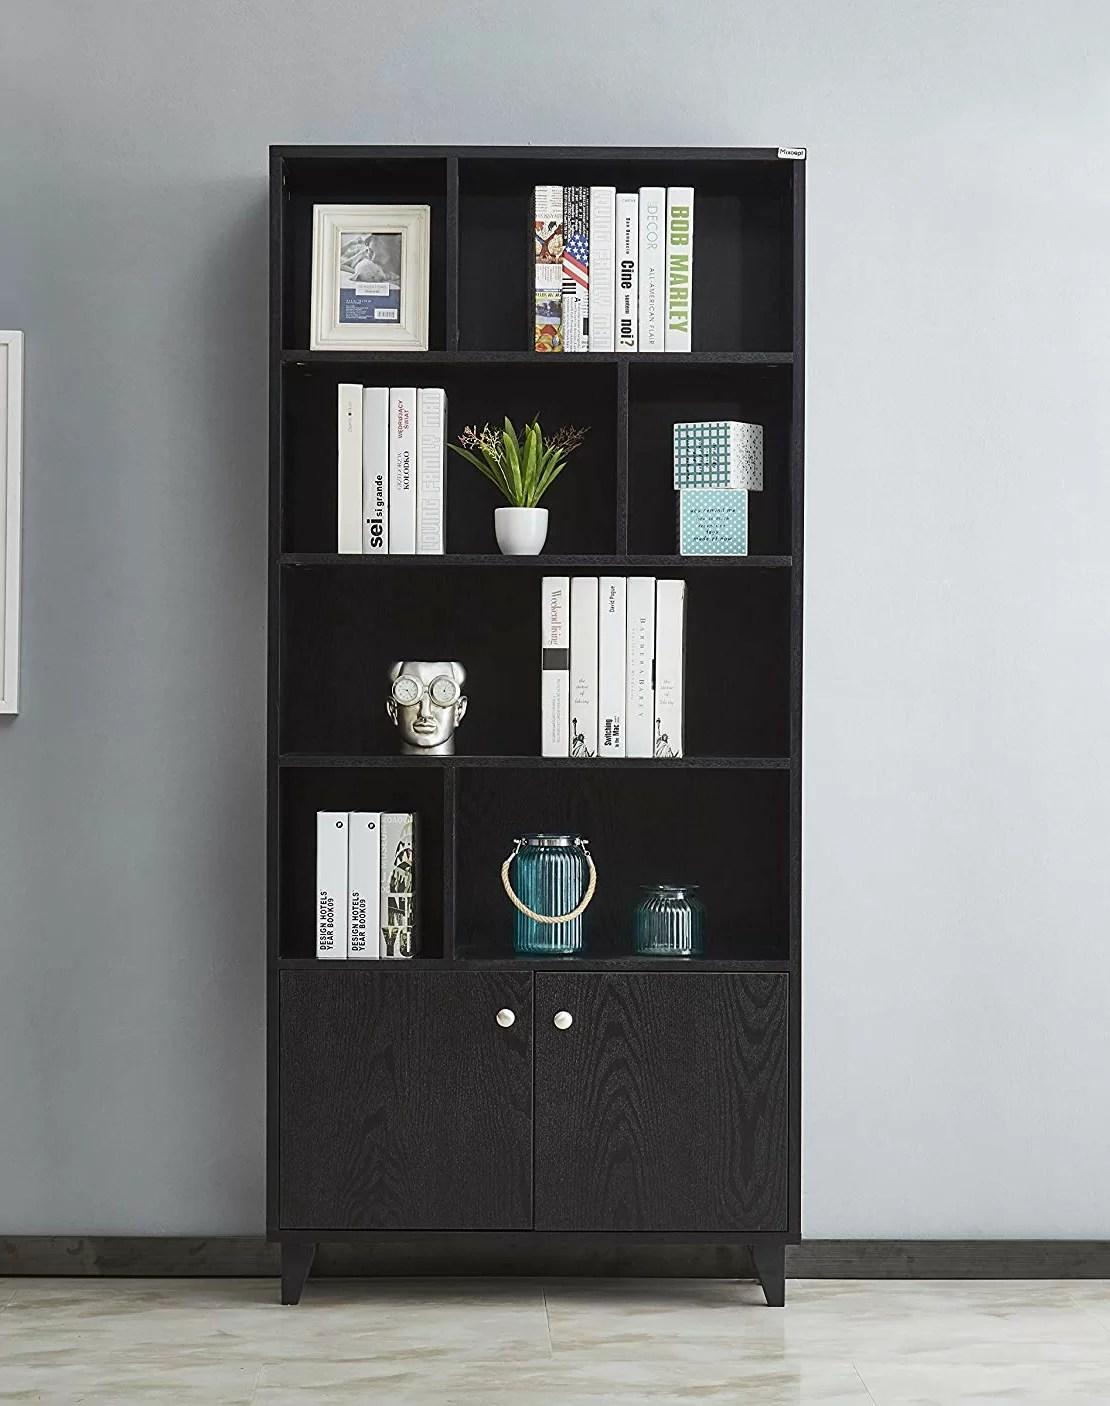 Rathore Barrister Bookcase